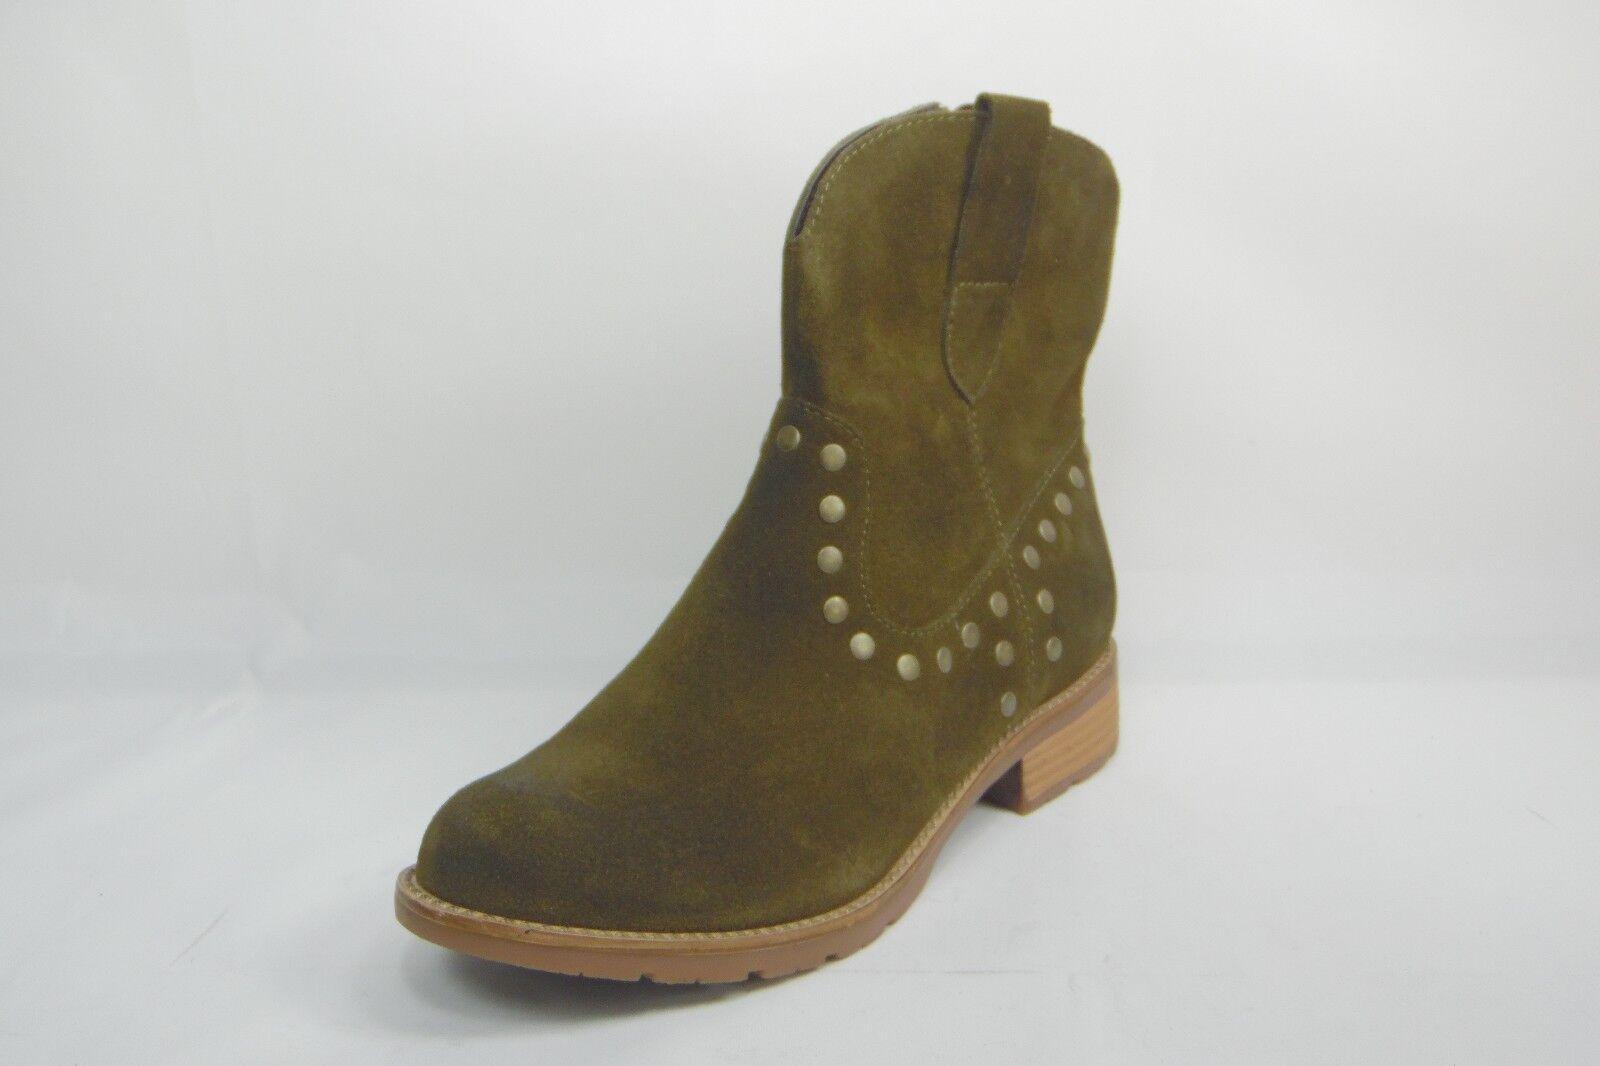 Eurosoft By Sofft Suede Leder Western Ankle Stiefel Low Heels Zip Green Größe 6M